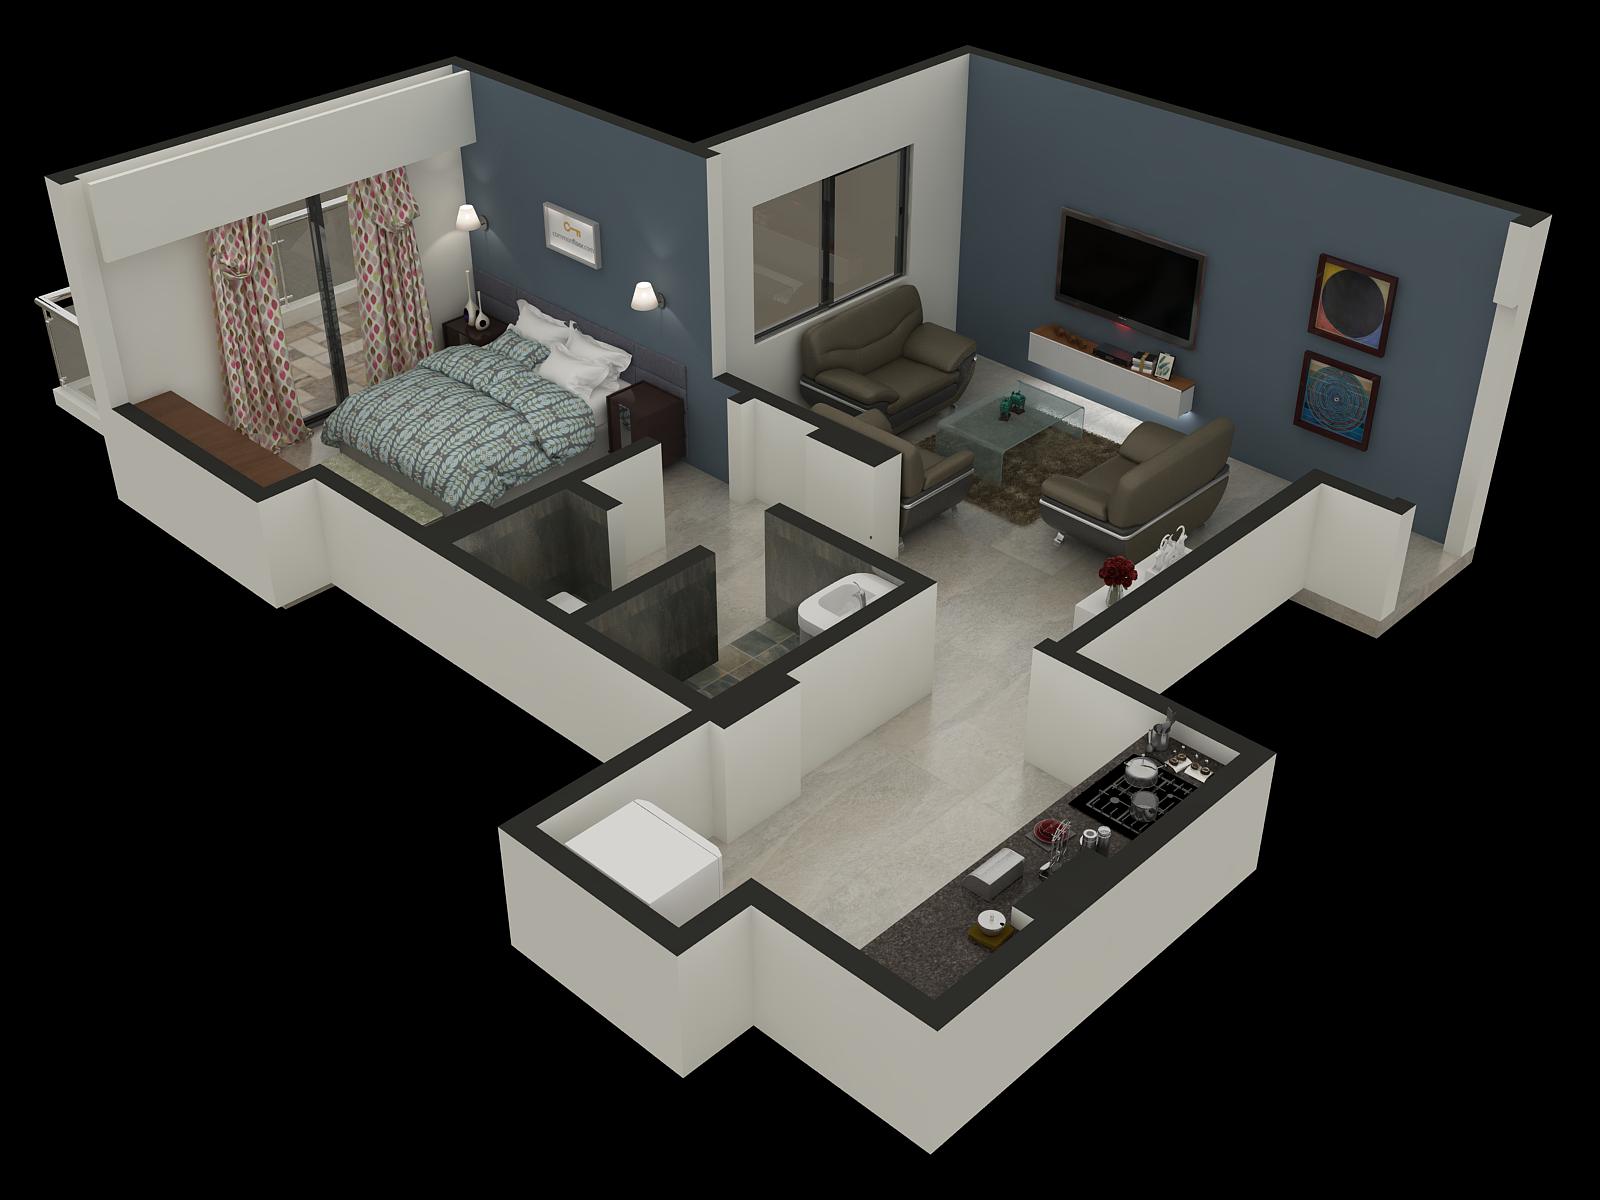 http://www.rayvatengineering/3d-floor-plan/ - 3d #floorplan